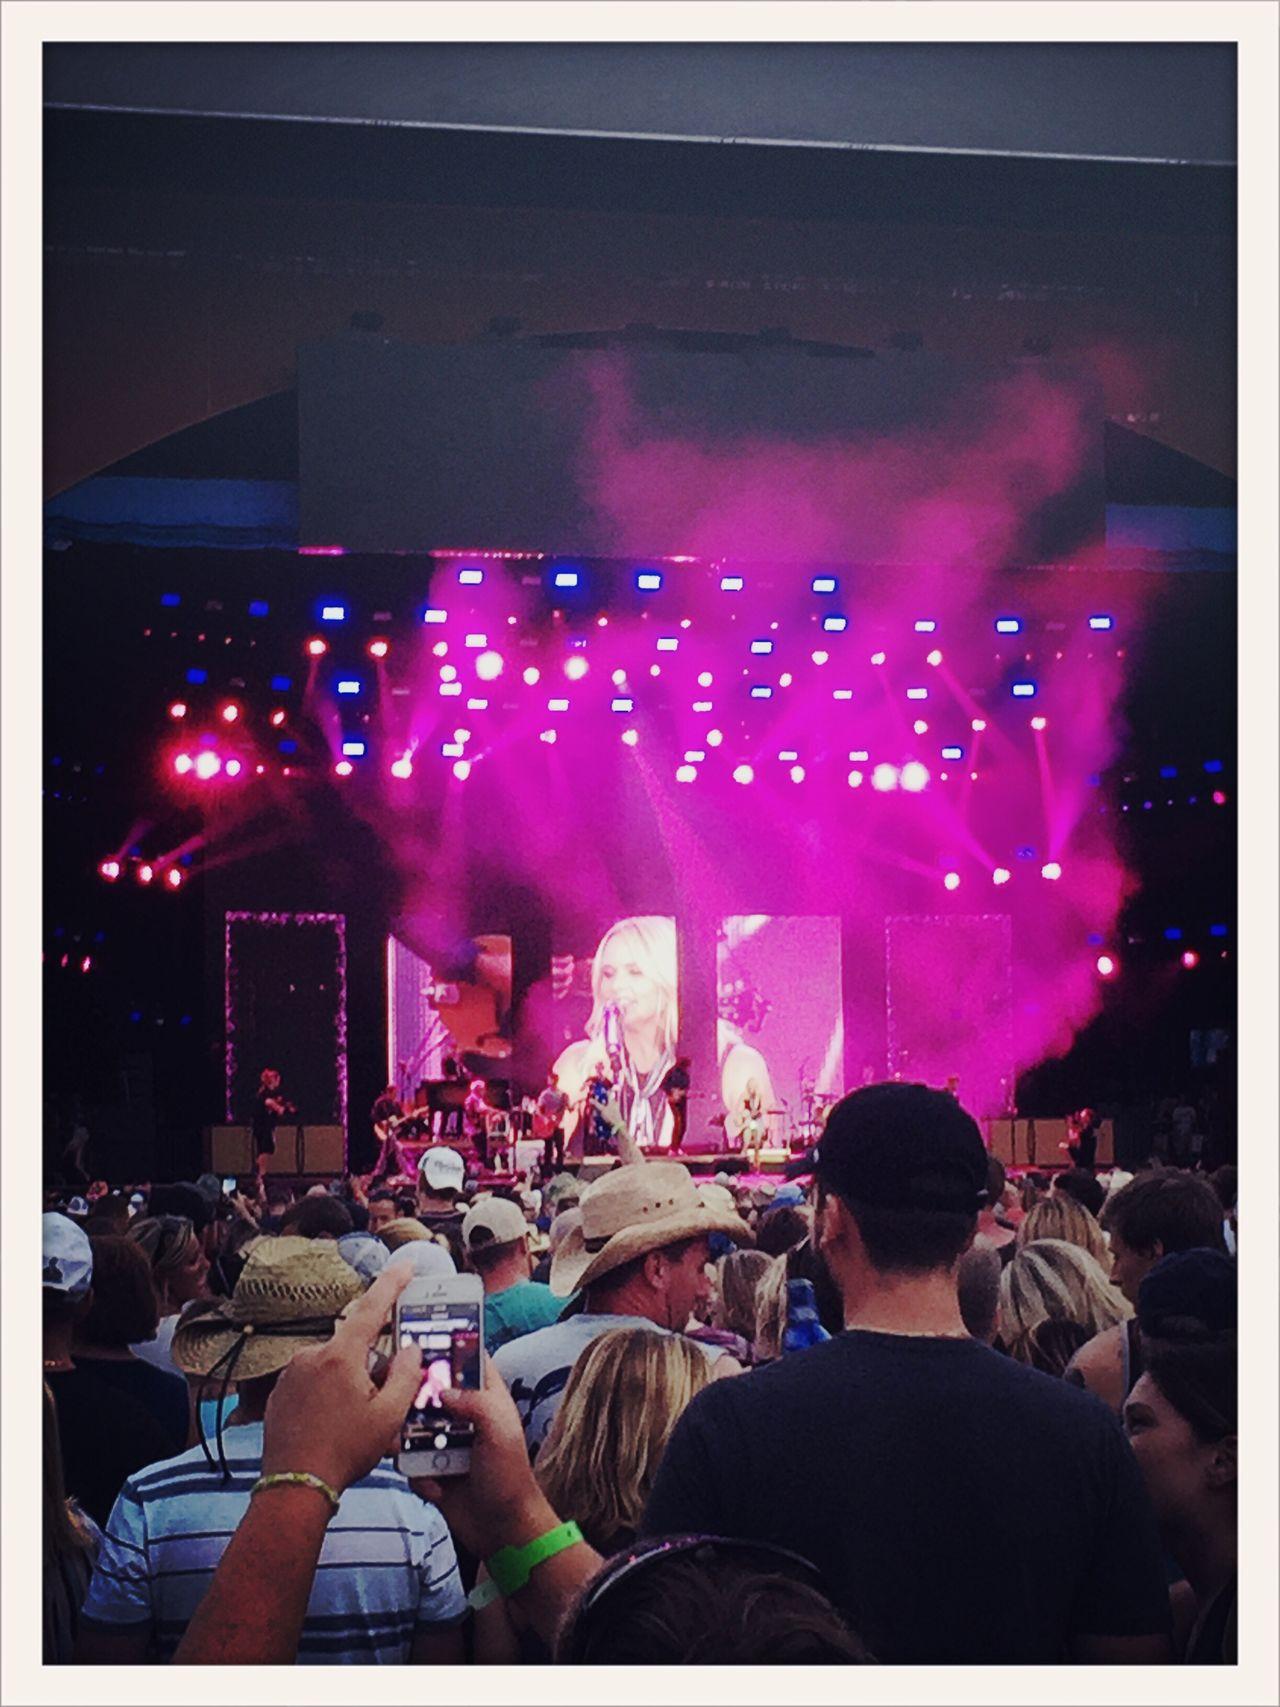 Country Fest: Miranda Lambert Miranda Lambert Best Of EyeEm NEM Mood Summer2016 Best EyeEm Shot AMPt_community Summer Concerts